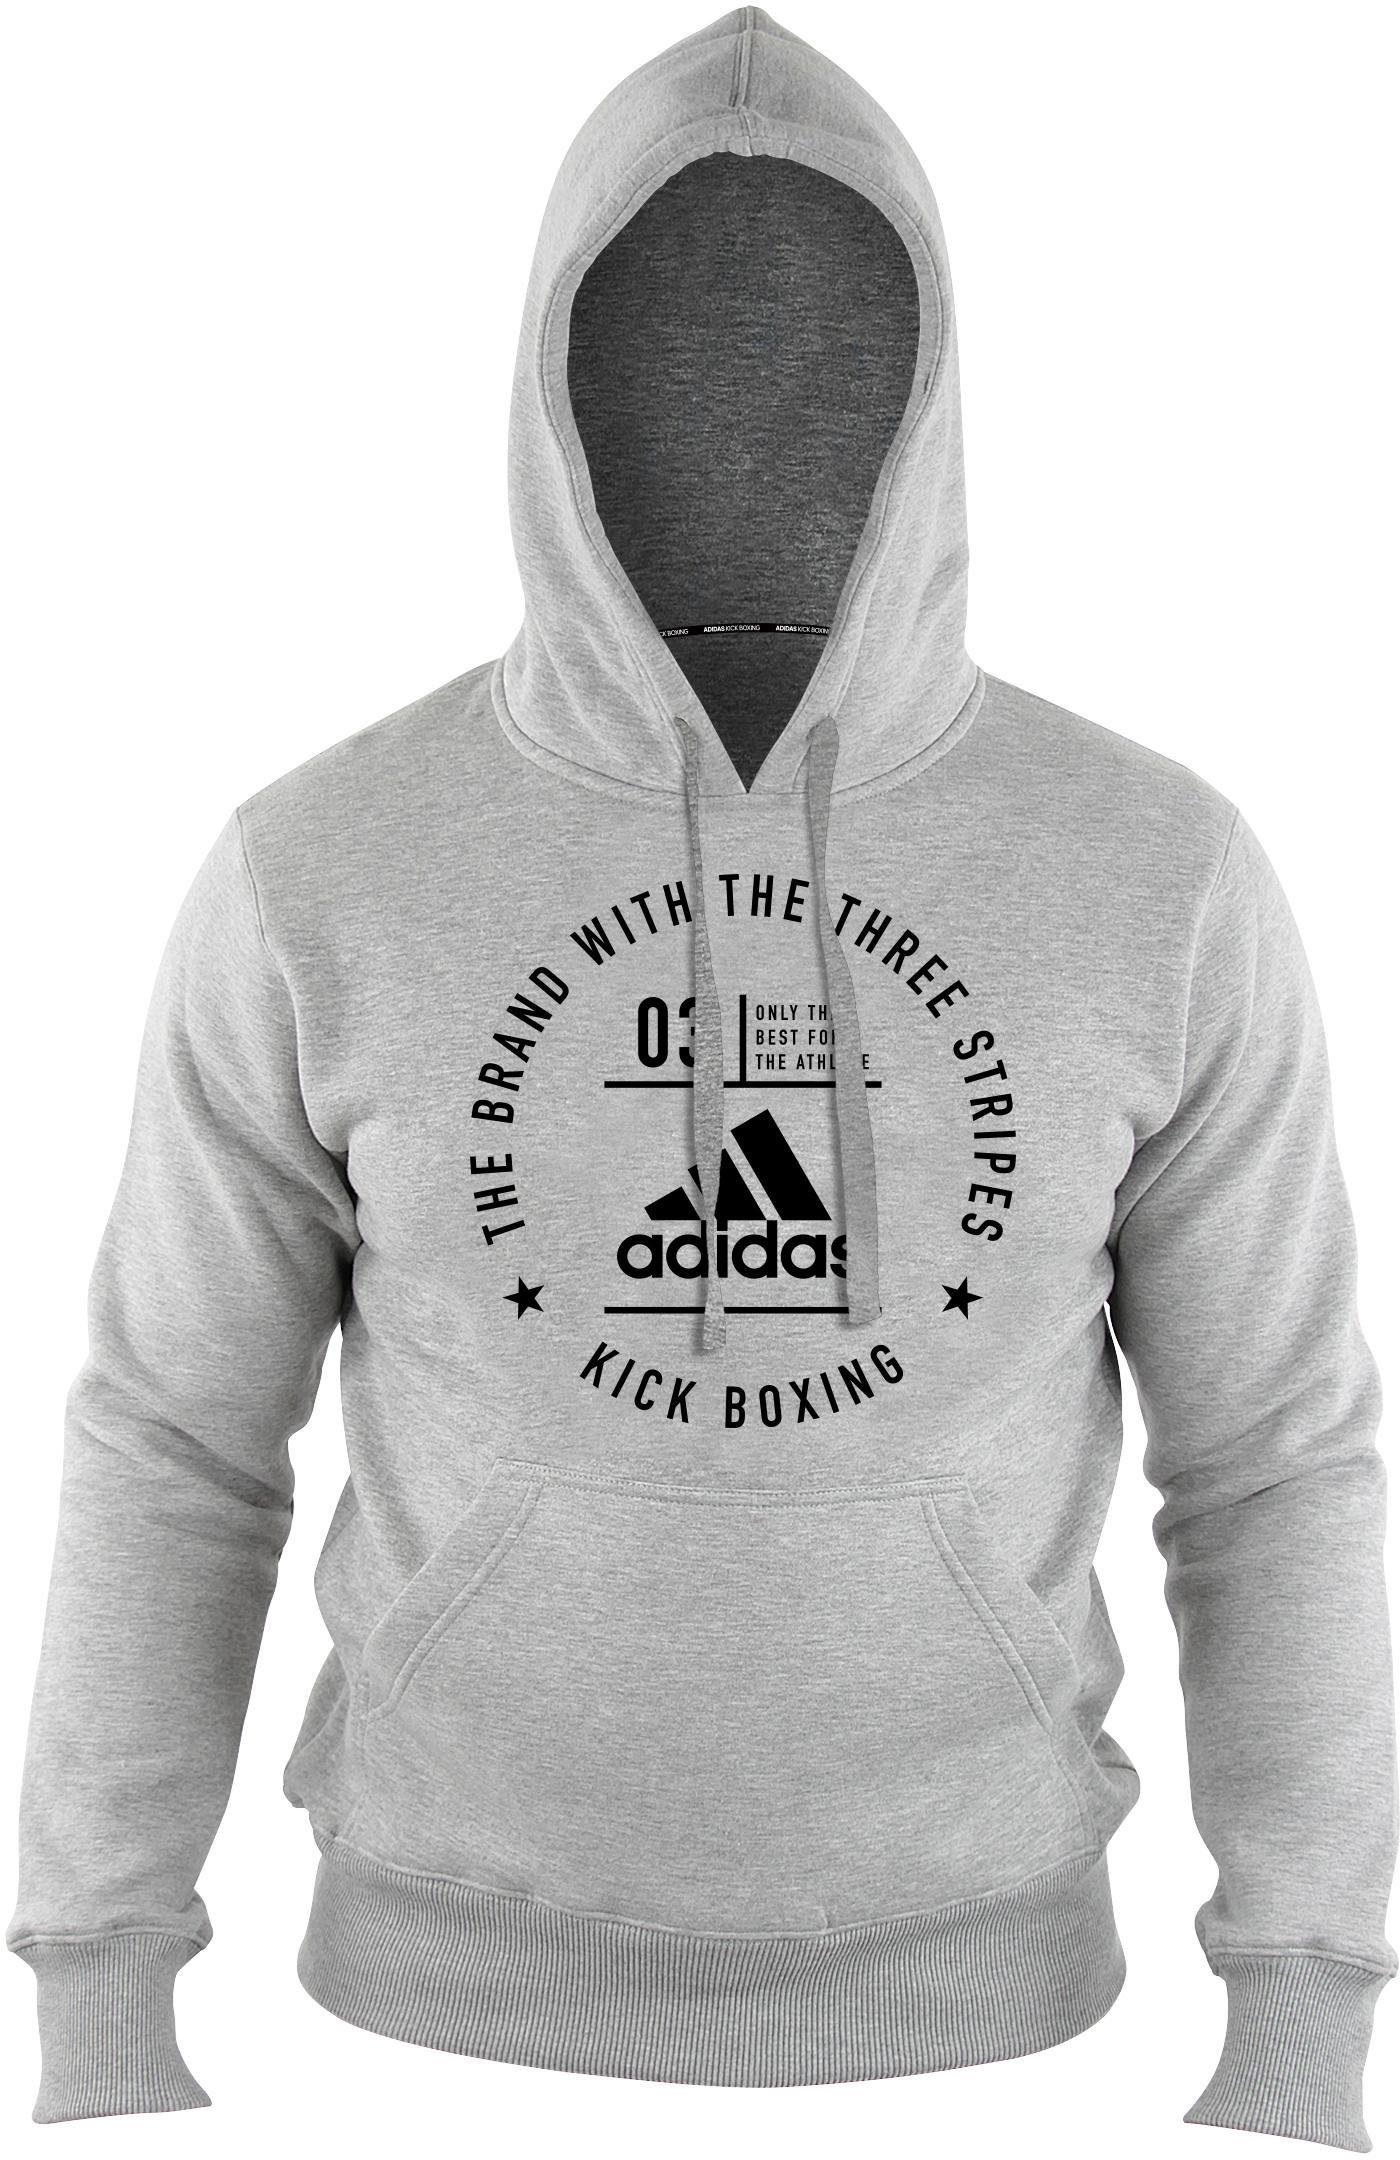 "adidas Performance Hoodie »Community Hoody ""Kickboxing""« online kaufen | OTTO"